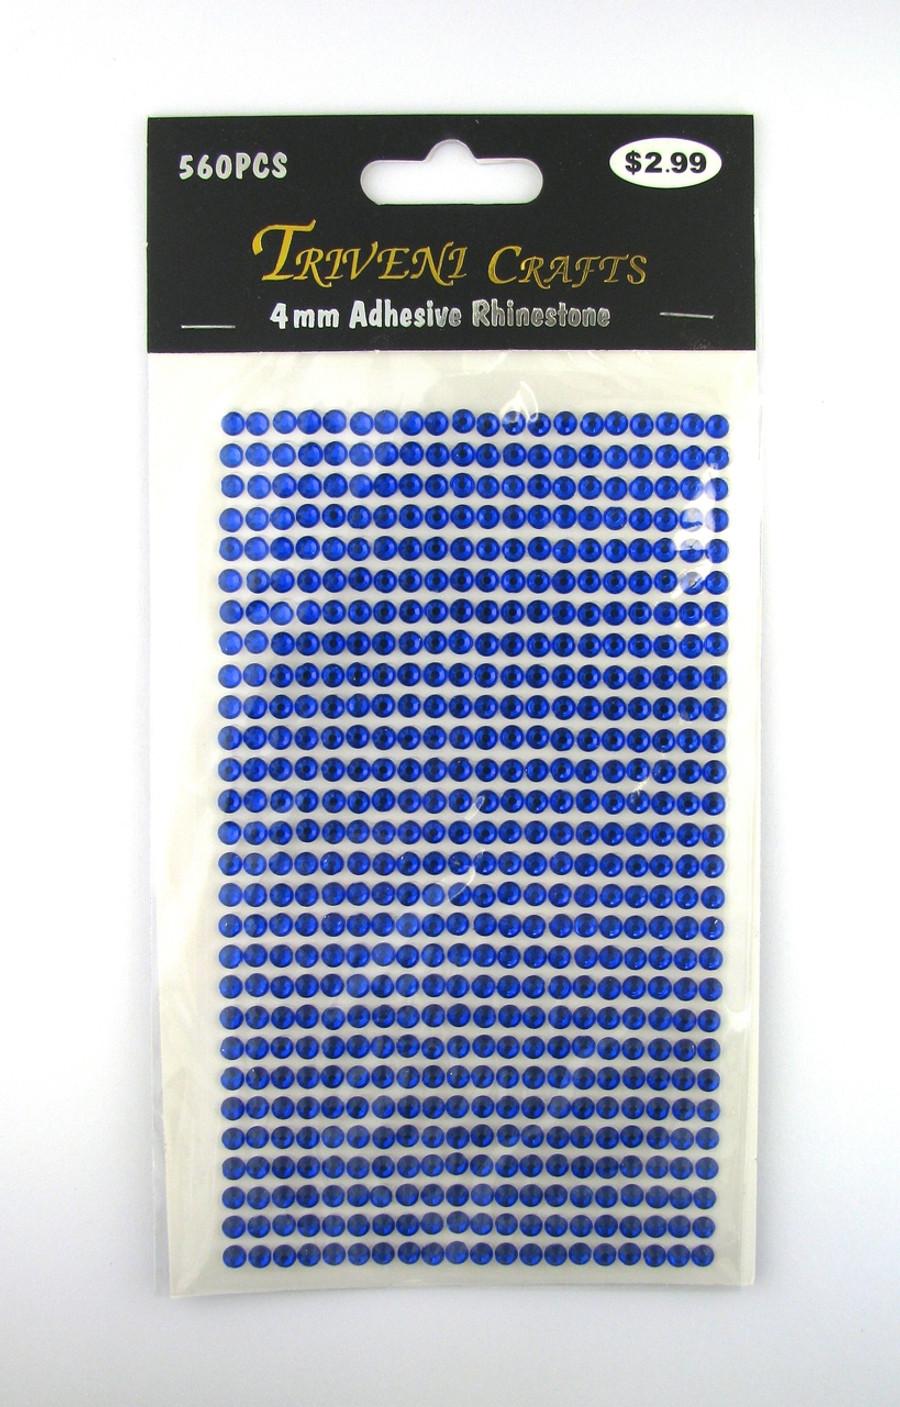 4mm Dark Blue Flatback Rhinestones (560 pcs) Self-Adhesive - Easy Peel Strips